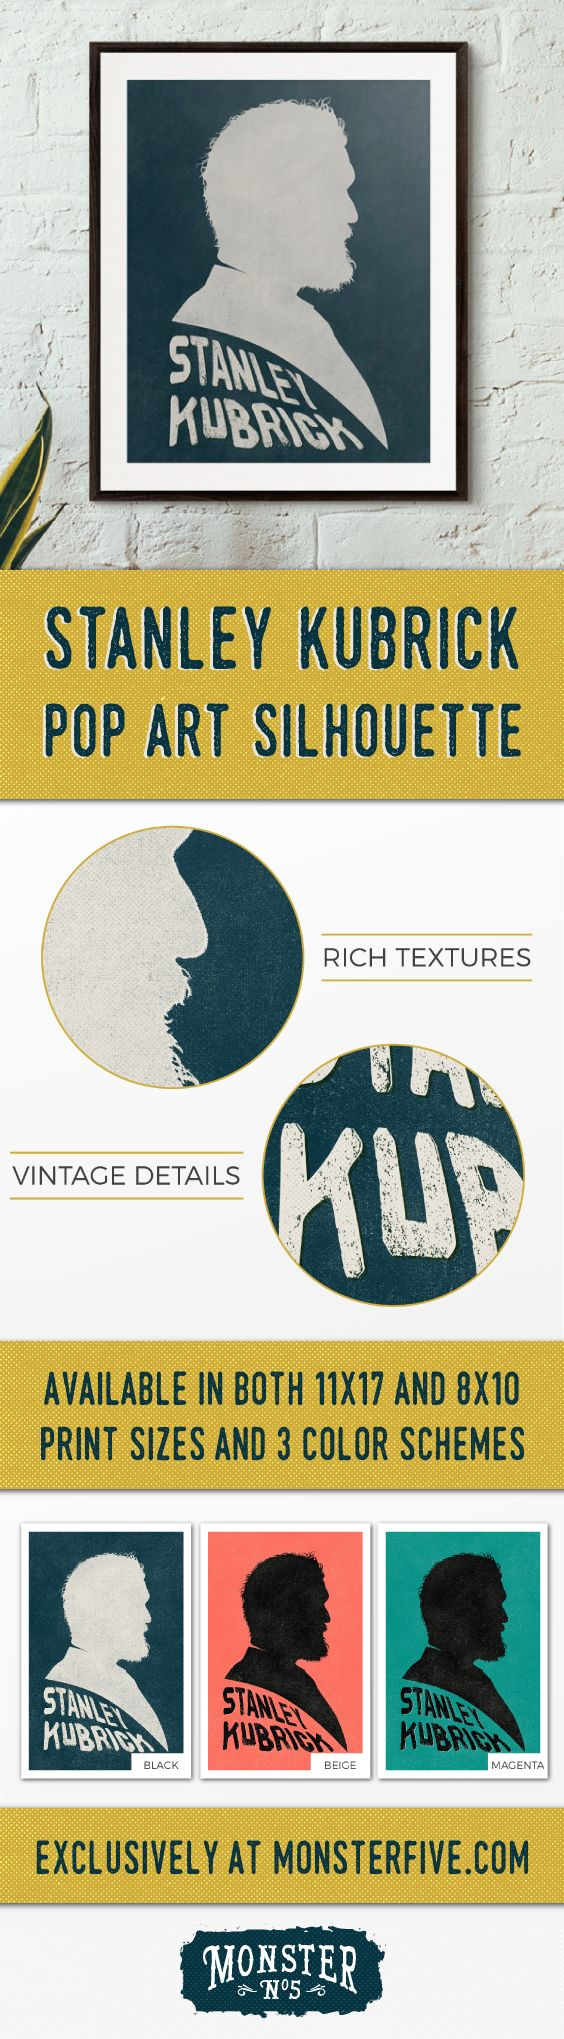 166 best Sleek Silhouettes & Vintage Style Portraits images on ...